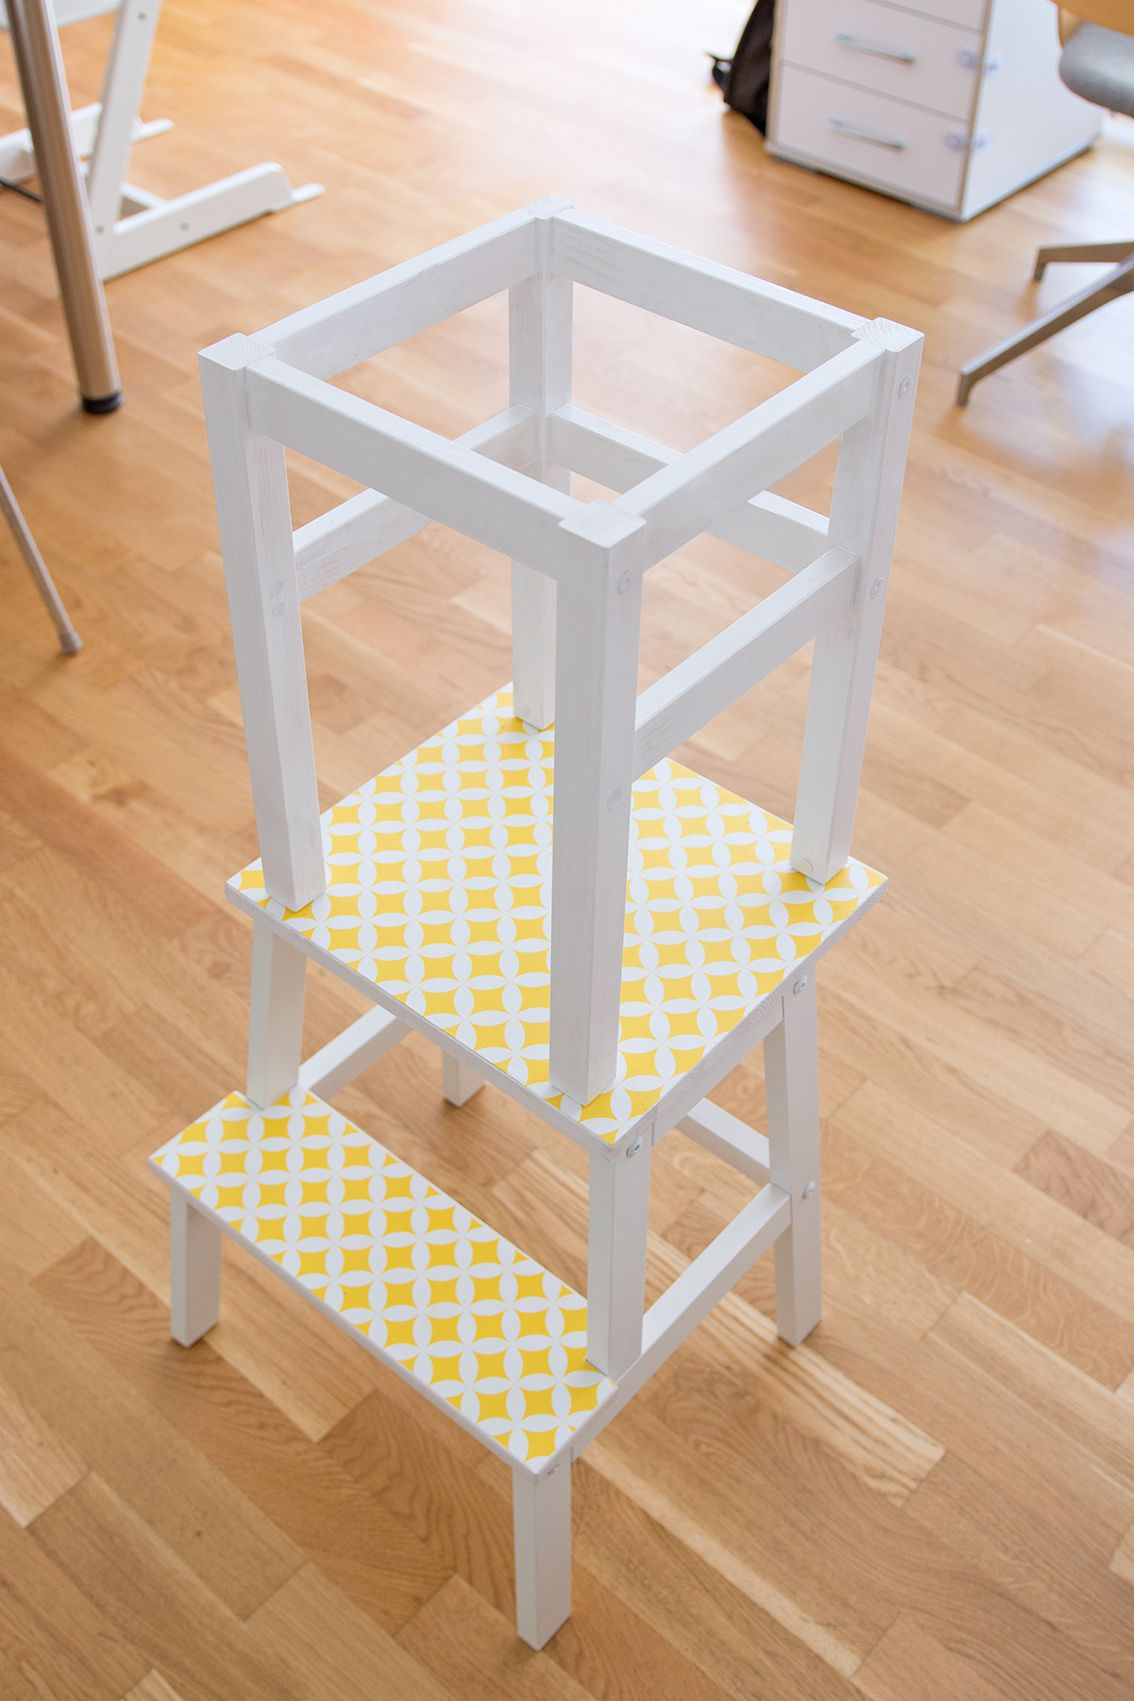 Astounding Lernturm Selber Bauen Ikea Hack Aus Zwei Hockern Lernturm Andrewgaddart Wooden Chair Designs For Living Room Andrewgaddartcom